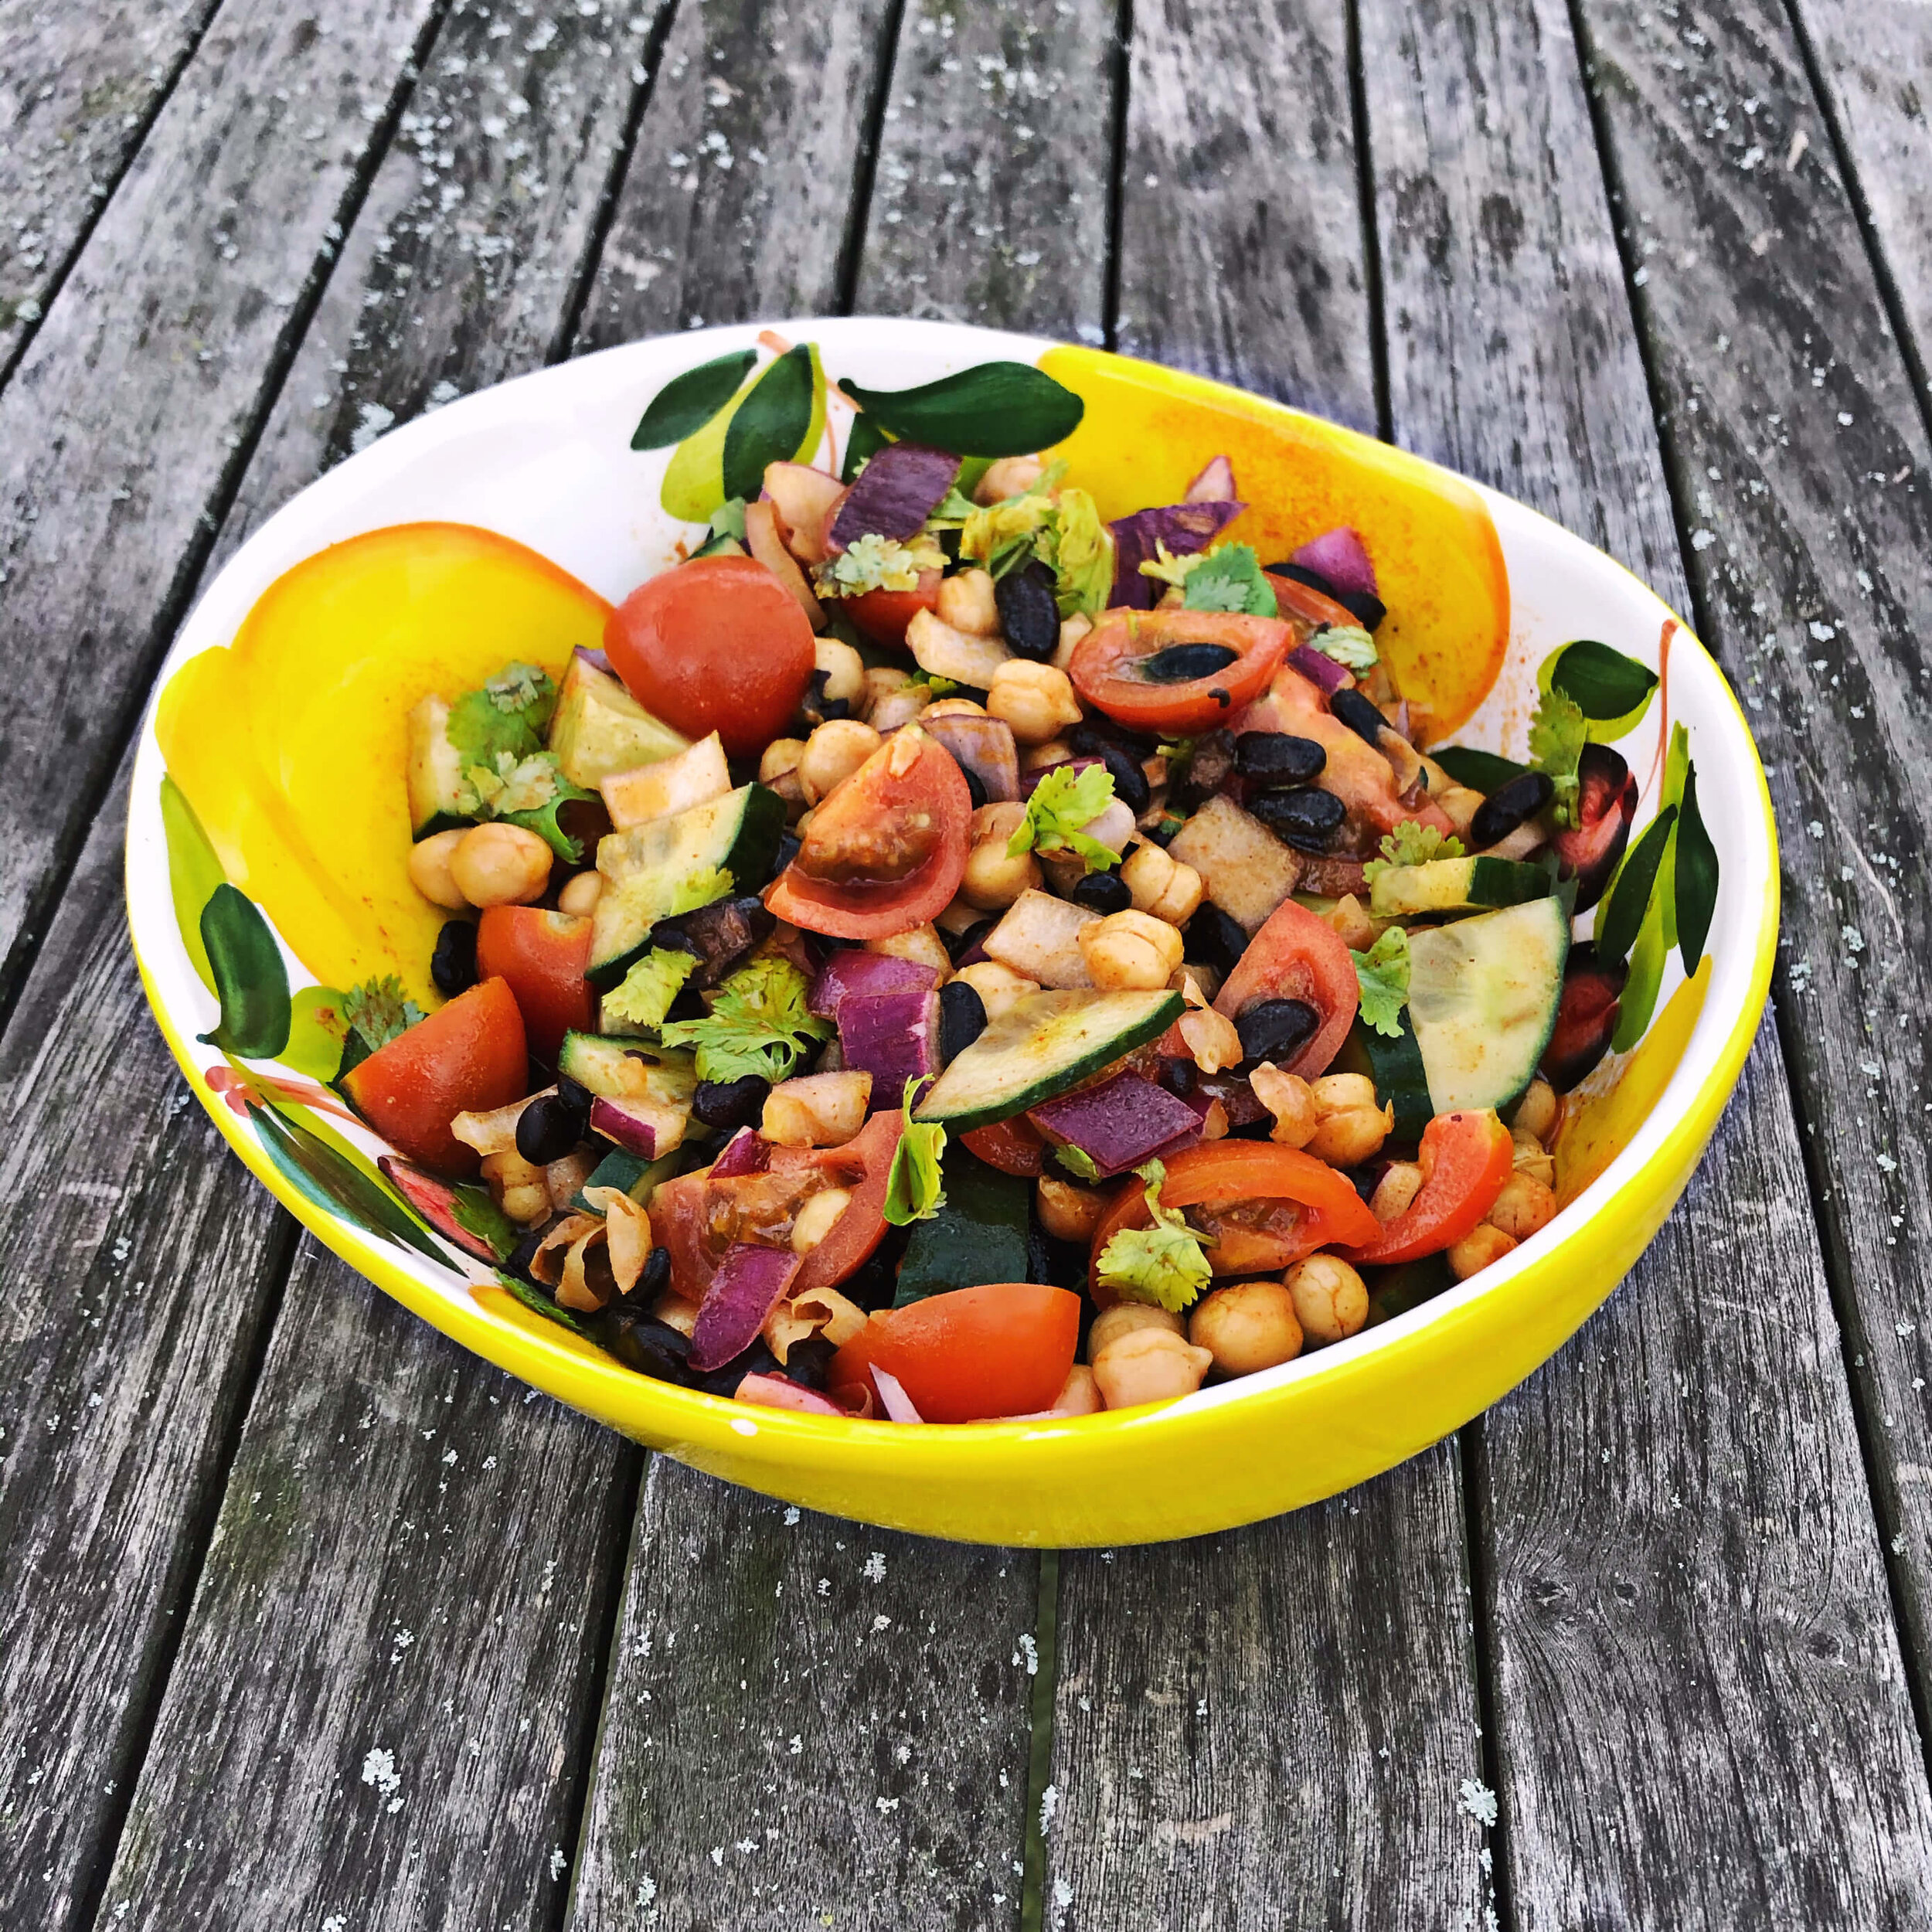 Chilli Lemon Bean Salad